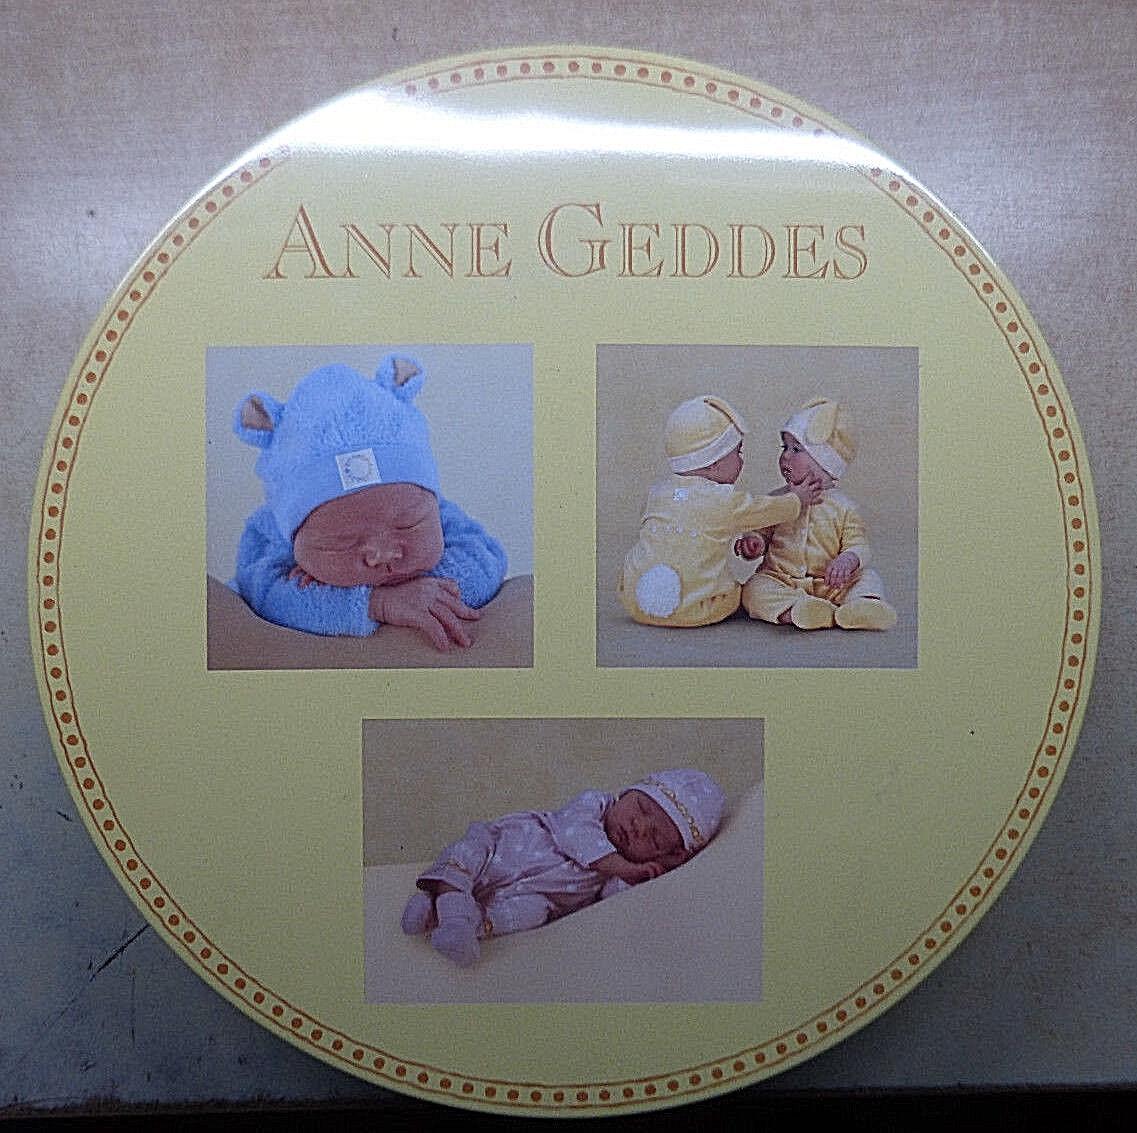 13267. Puzzle-Set, Anne Geddes, Babys, Tin Box, 3 x 1000 Teile Puzzle